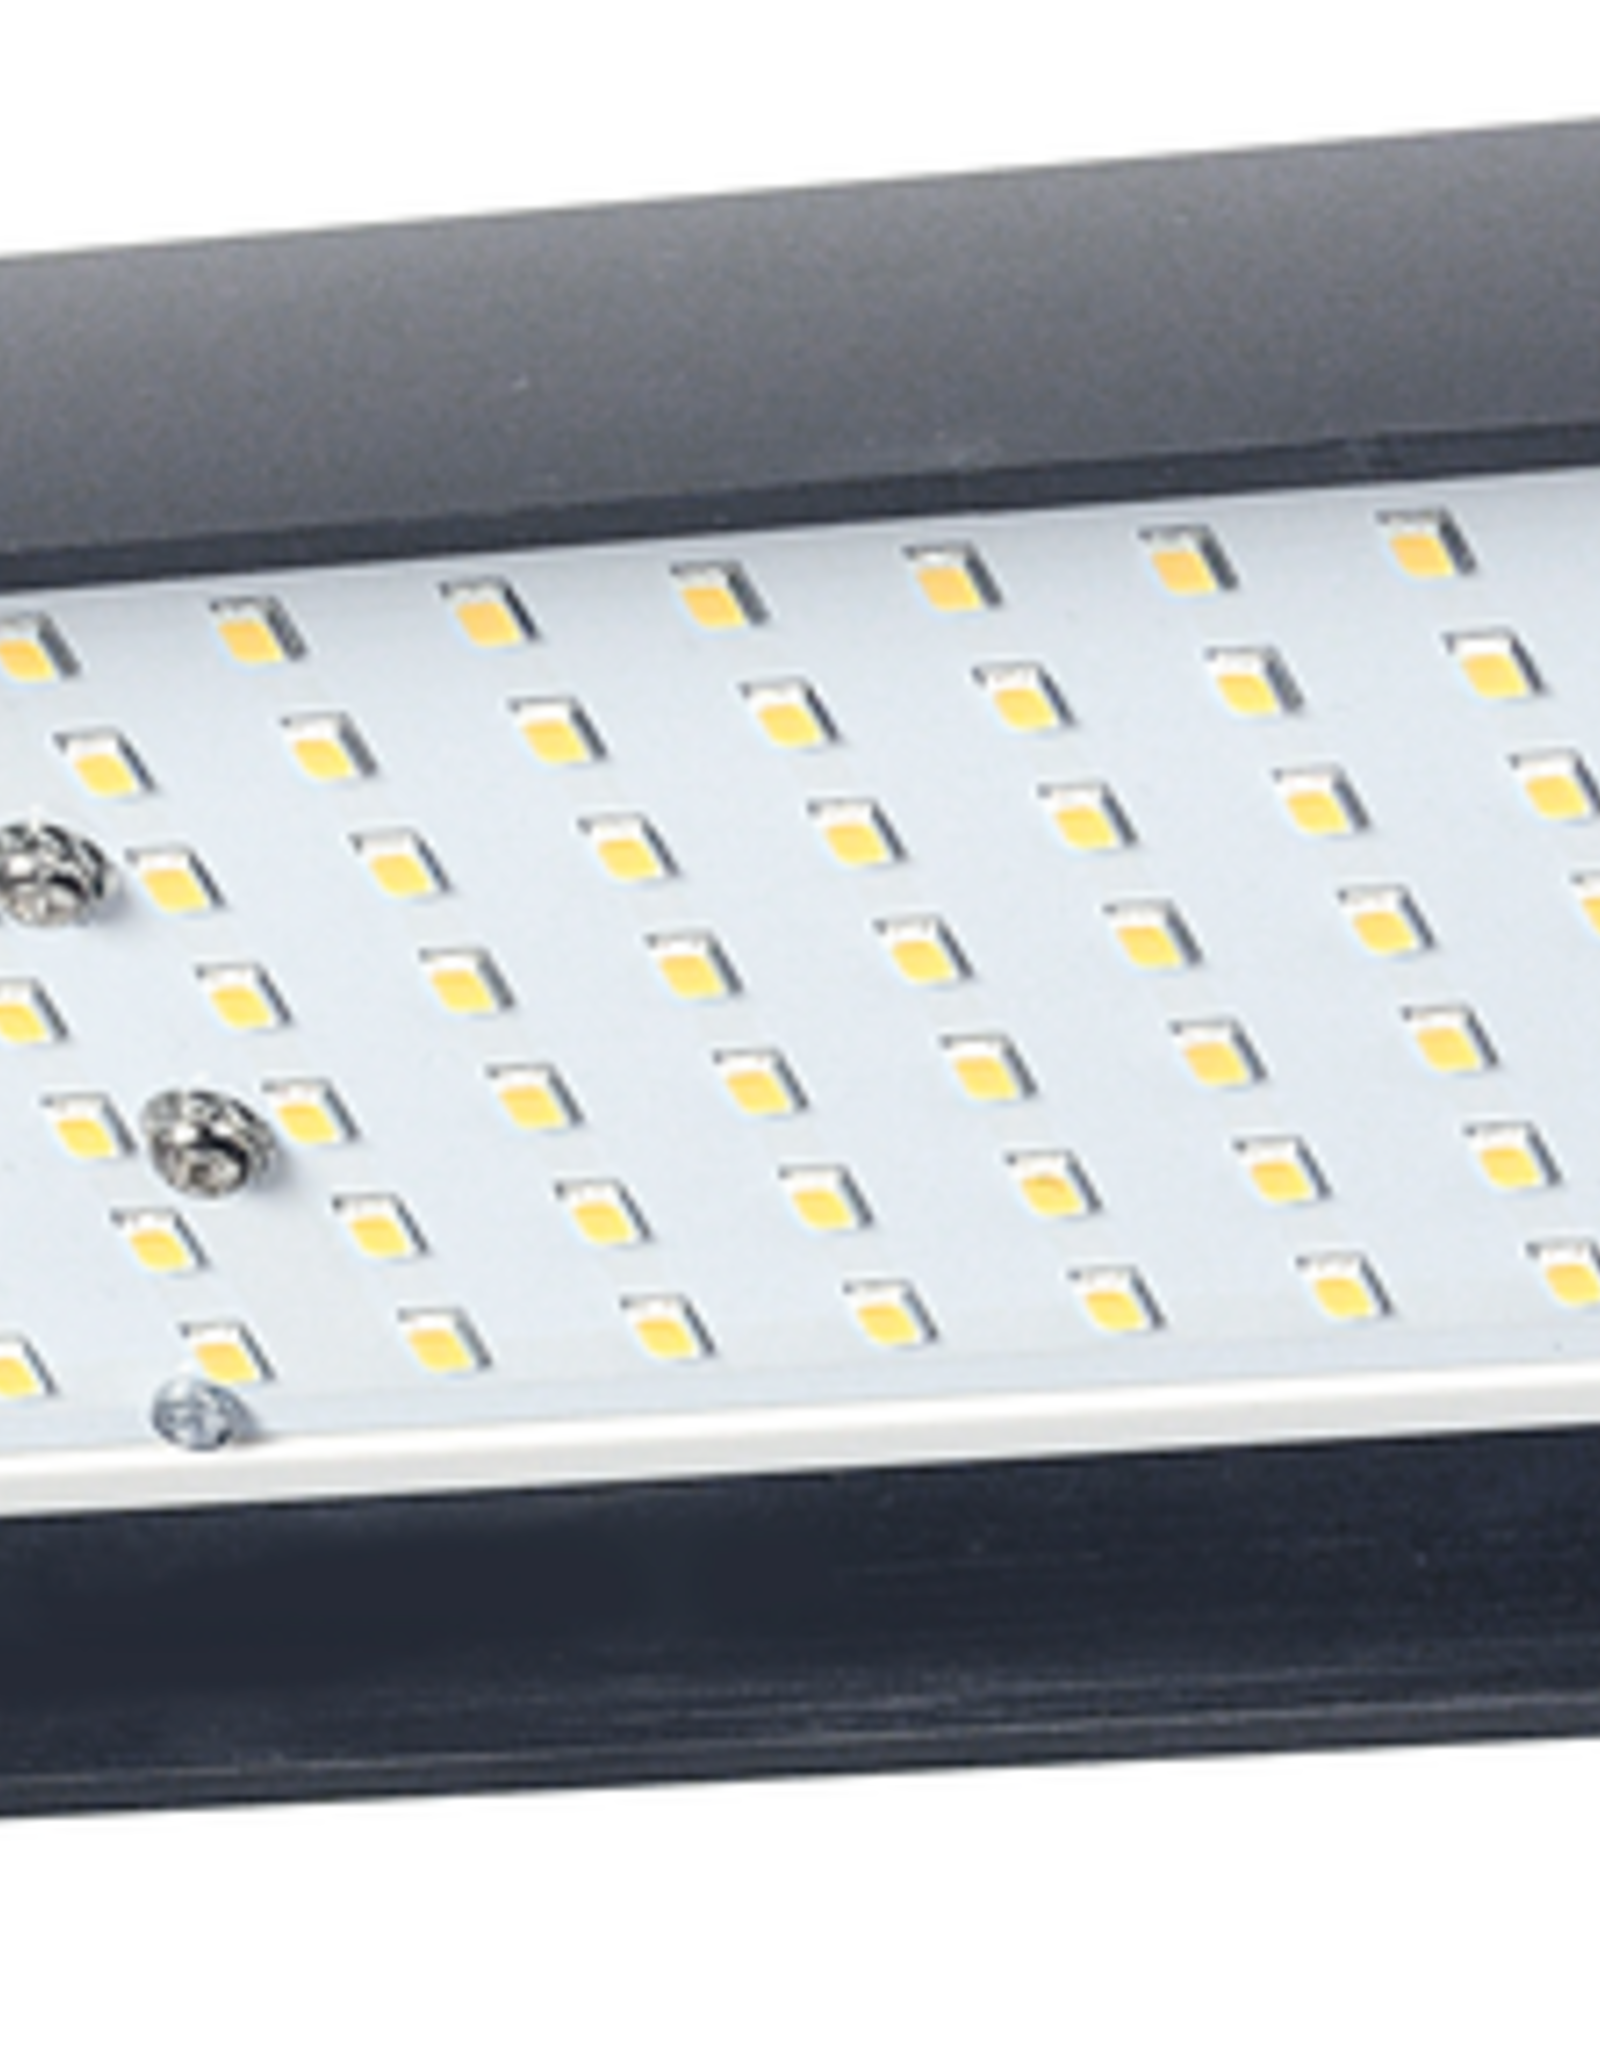 Kaiser Kaiser LED RB 5070 DX2 Lighting Unit, 2x161 SMD LEDs, 5600 K, CRI 95, angle of radiation: 110°, illuminance on subject surface: 3000 lux, dimmable, flicker free,  100 - 120 V / 60 Hz, US-Plug